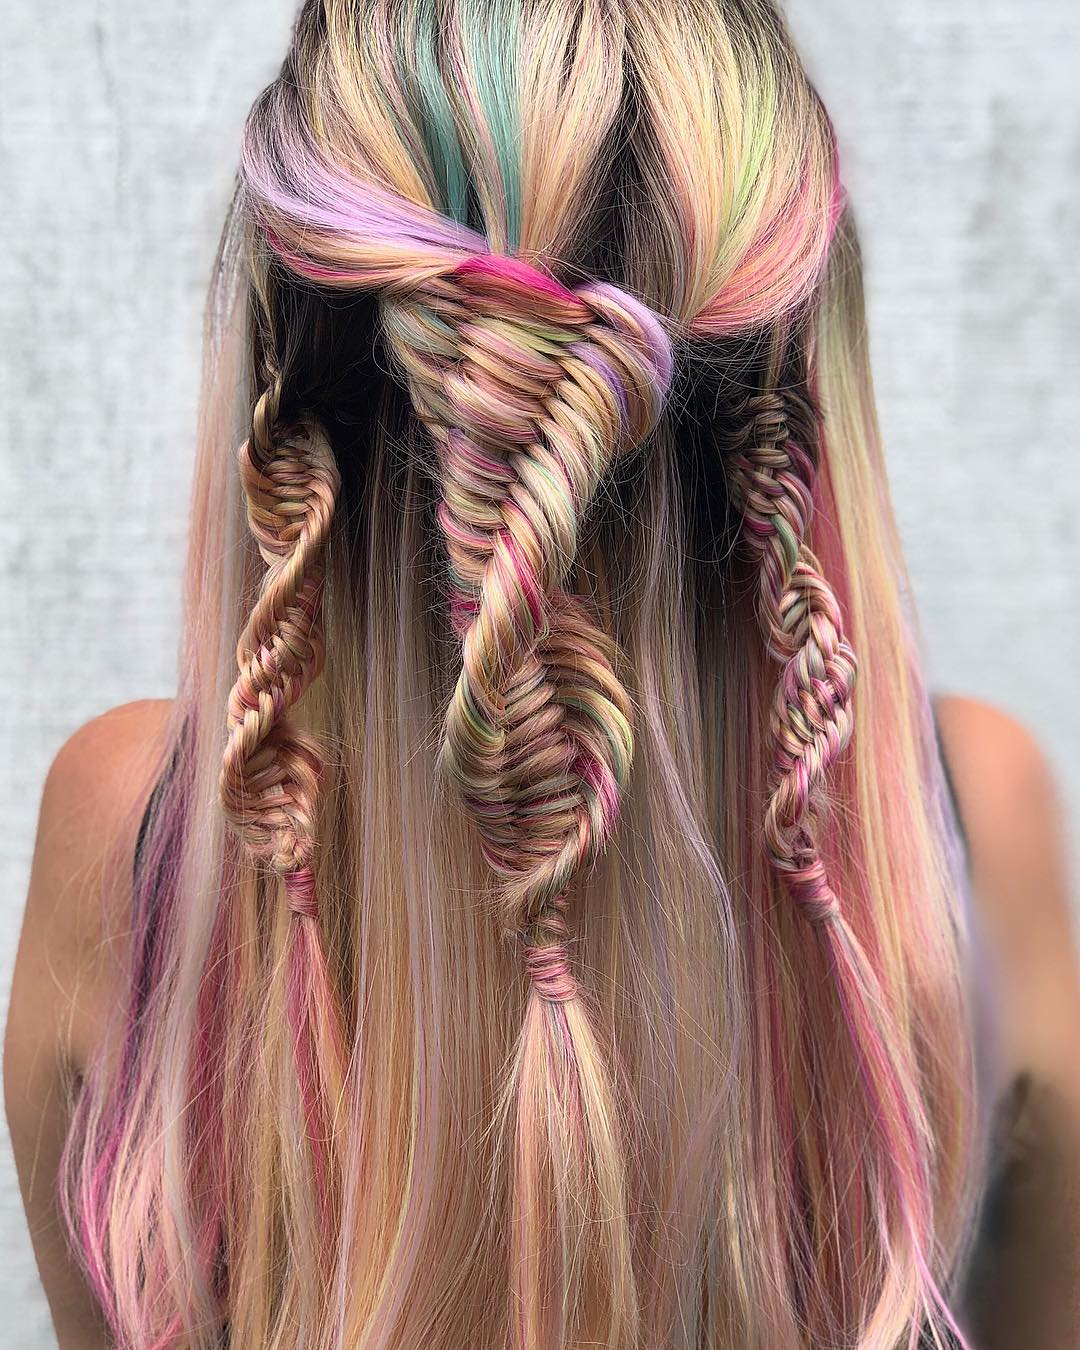 Peinados con trenza maria